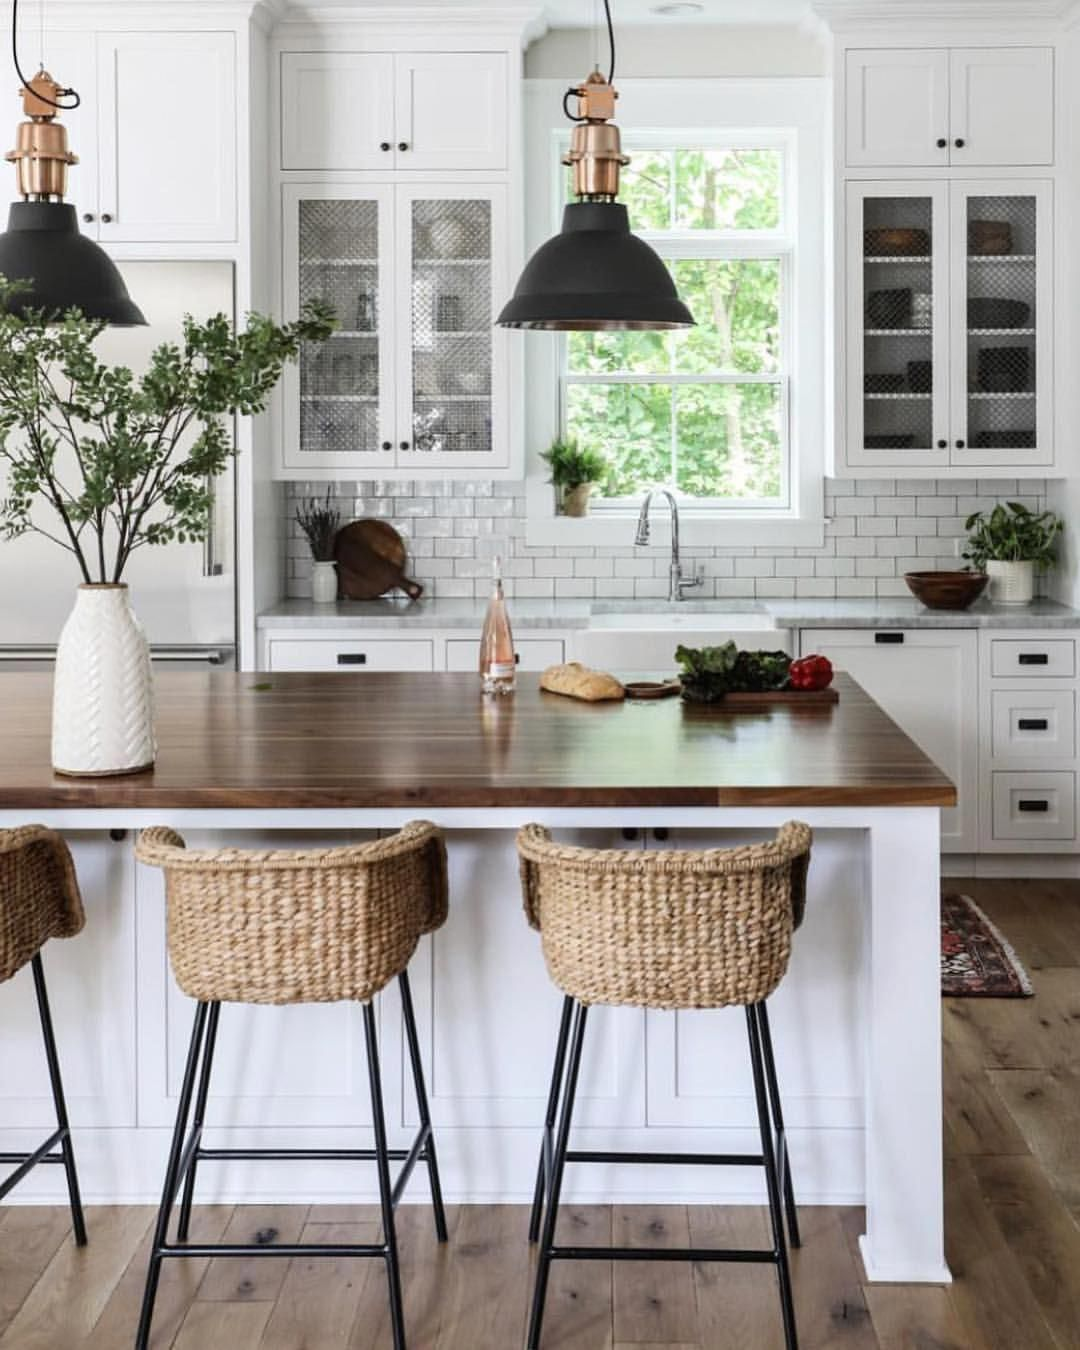 Independent set or set up kitchen remodeling inspiraitons